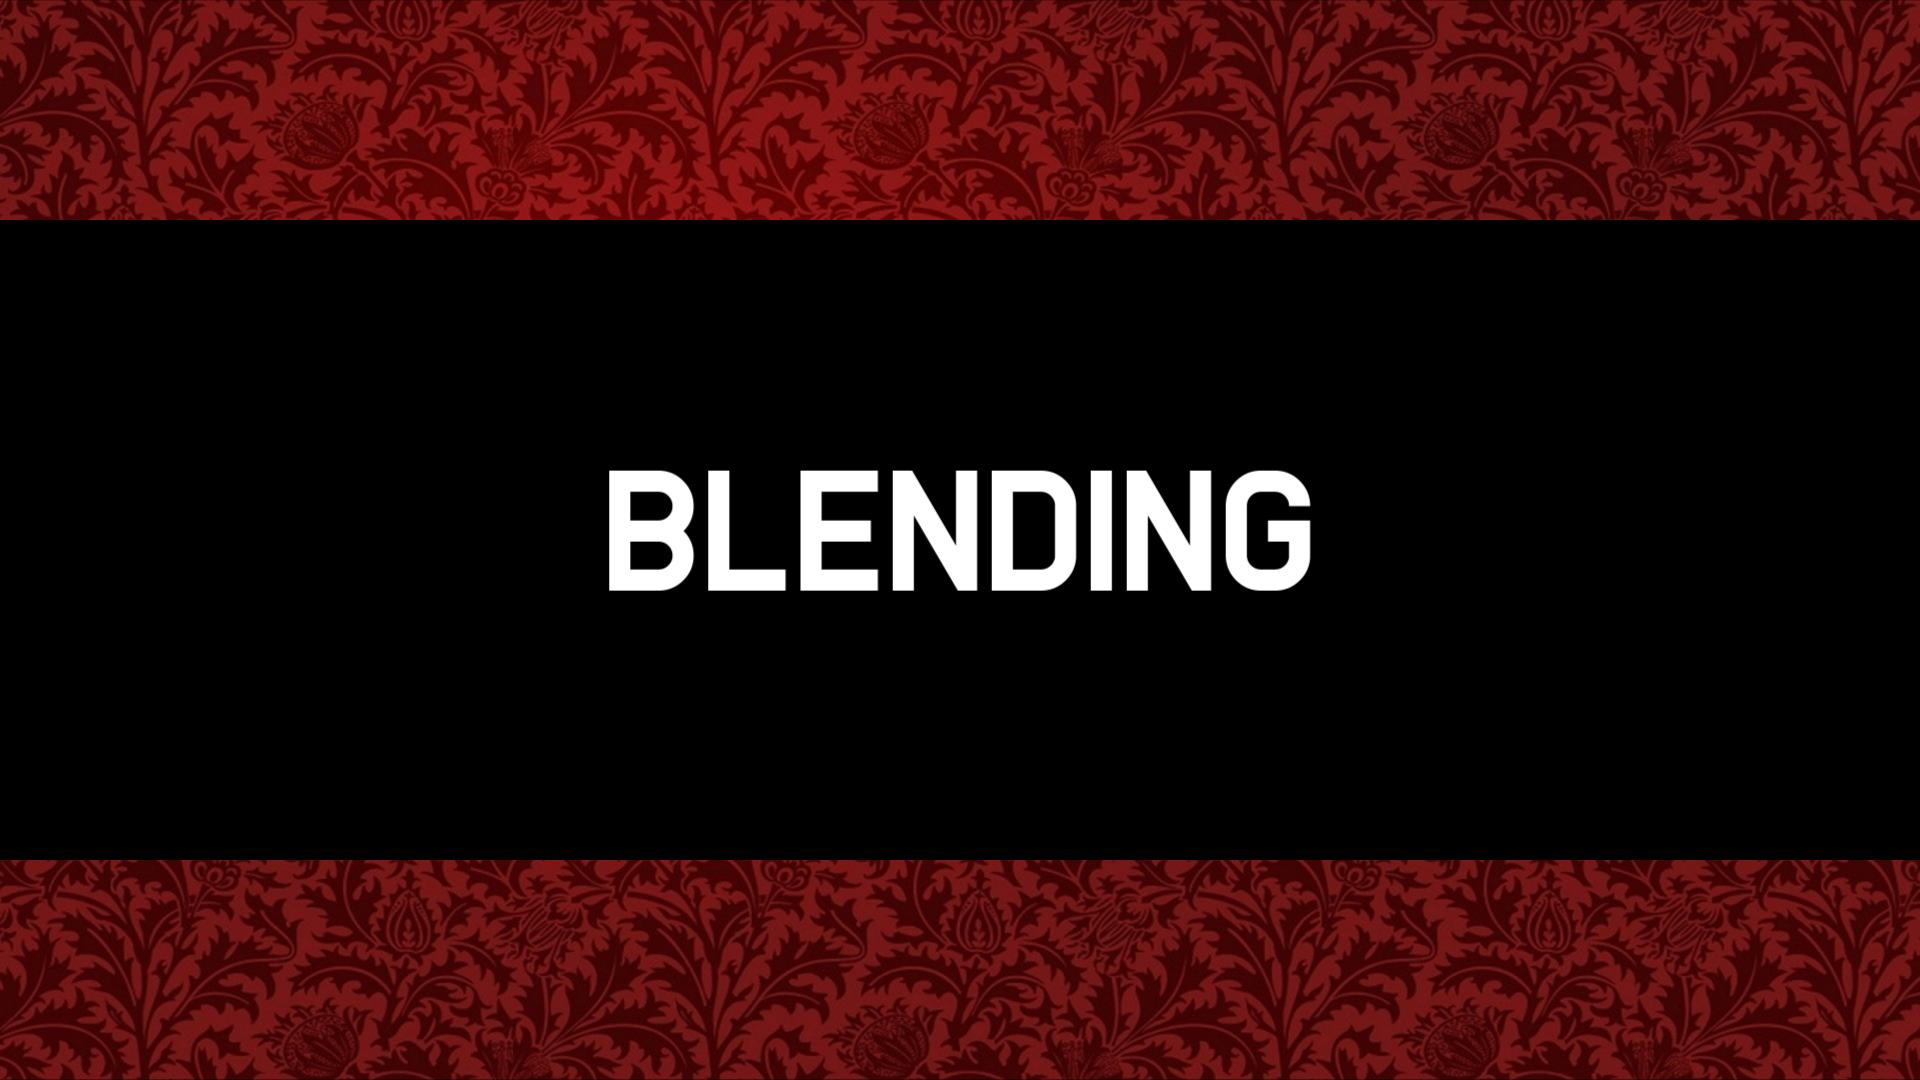 Blending.png.051cf2d676ee2e03cc3740b2ef6830a1.png